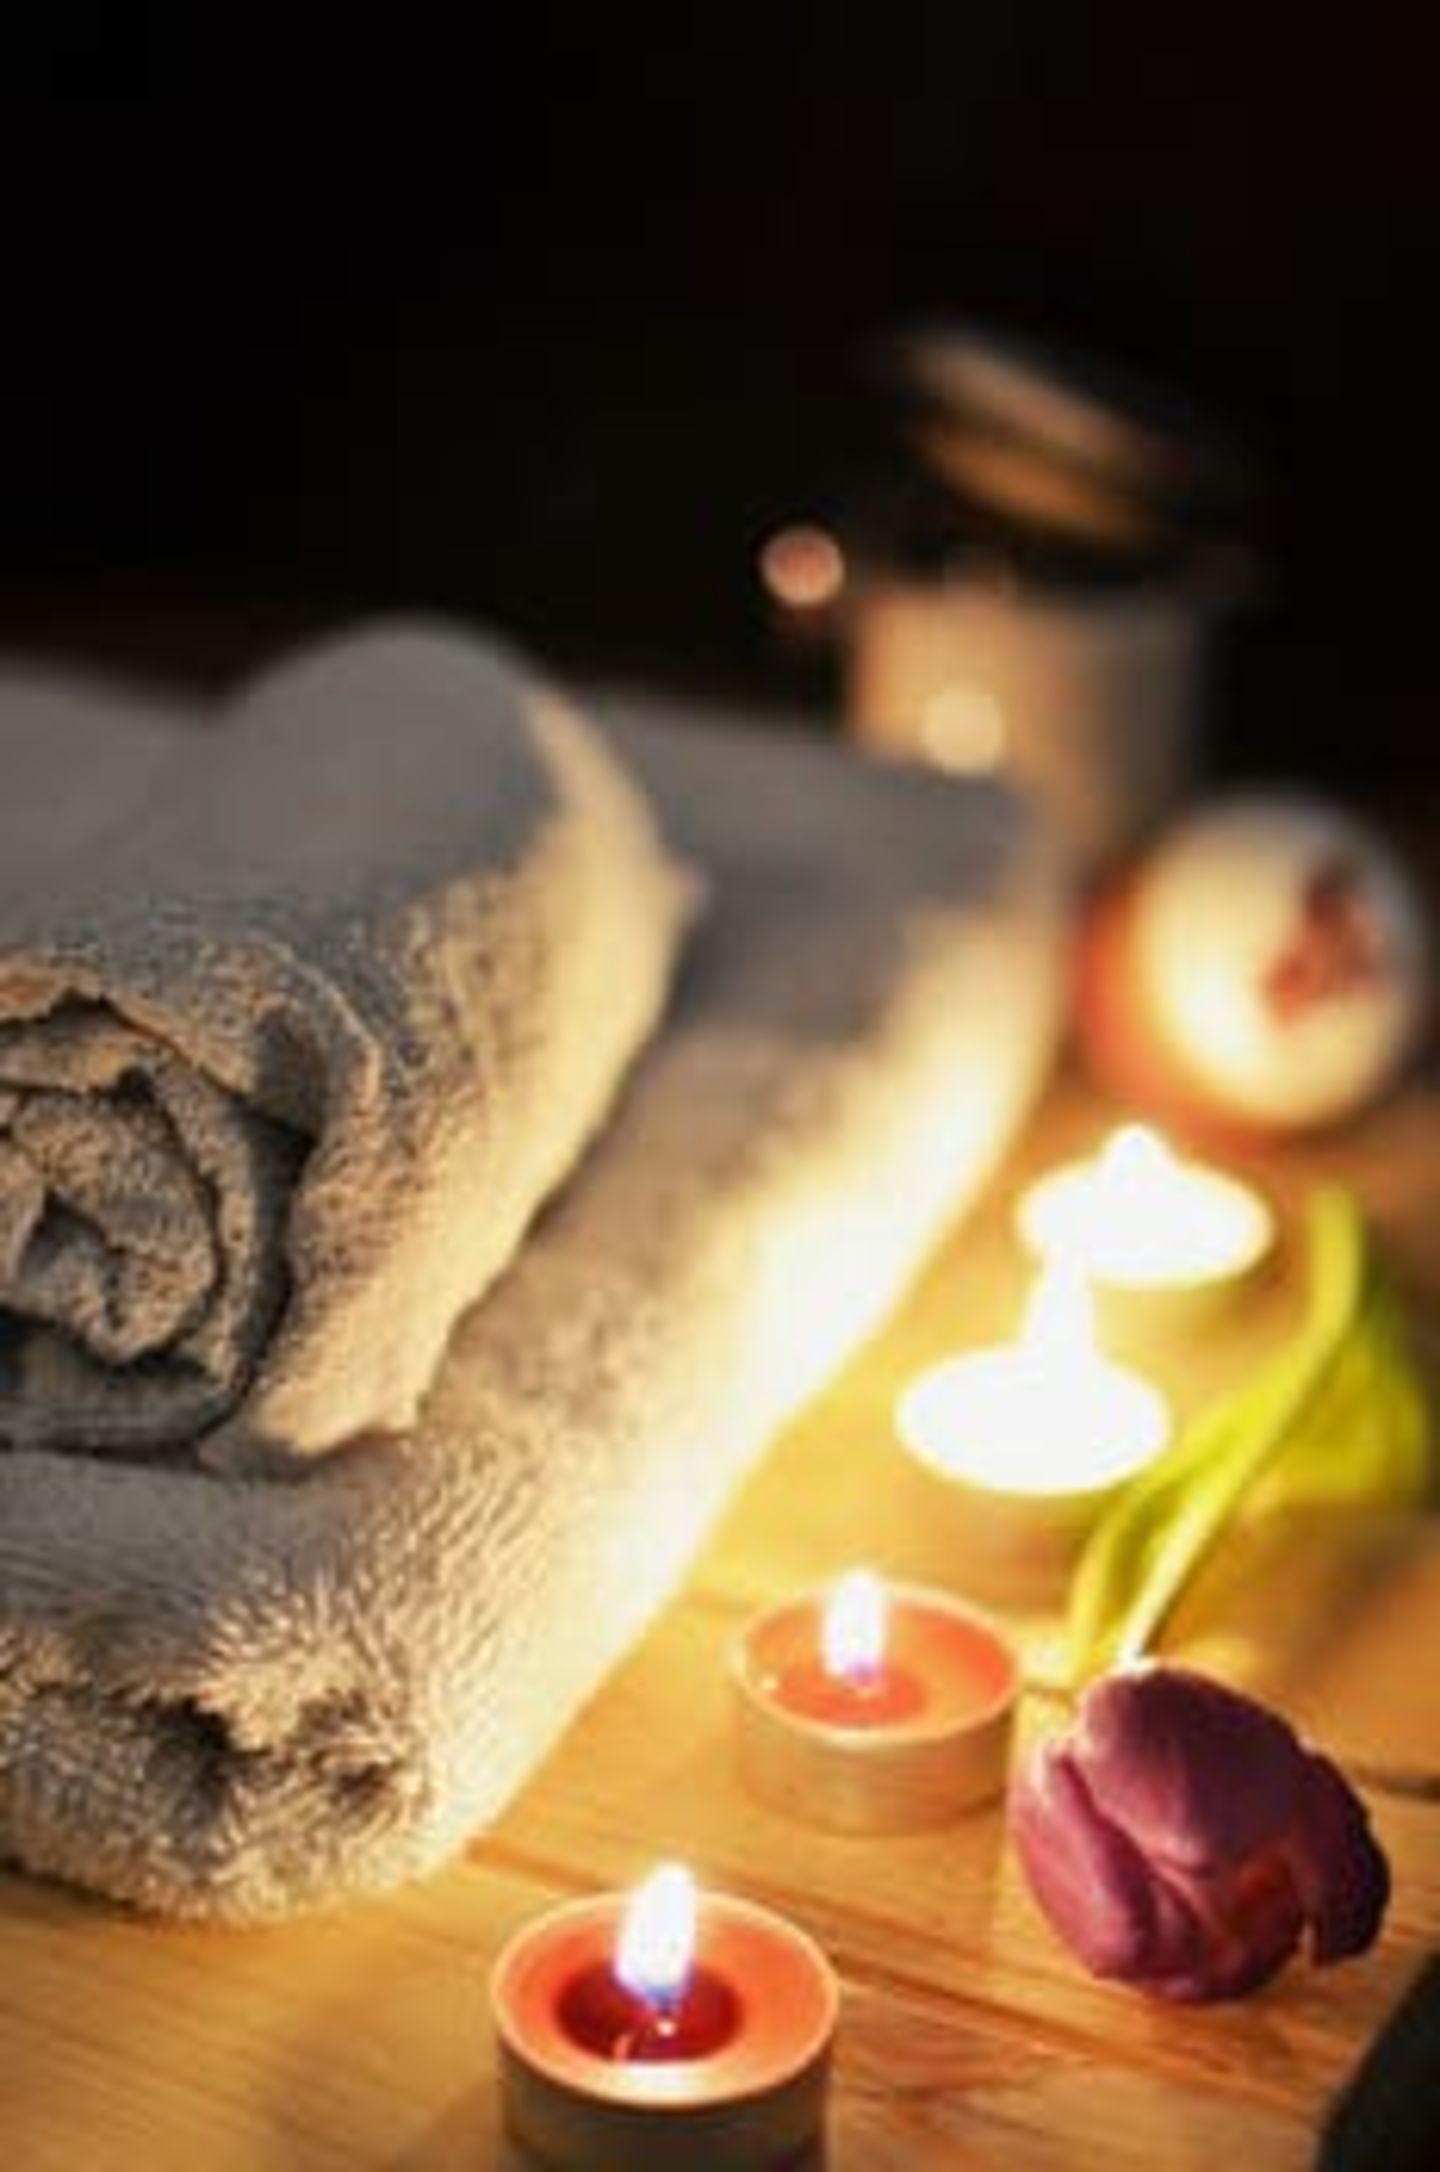 HiDubai-business-lamasat-leena-ladies-salon-beauty-wellness-health-beauty-salons-al-khabaisi-dubai